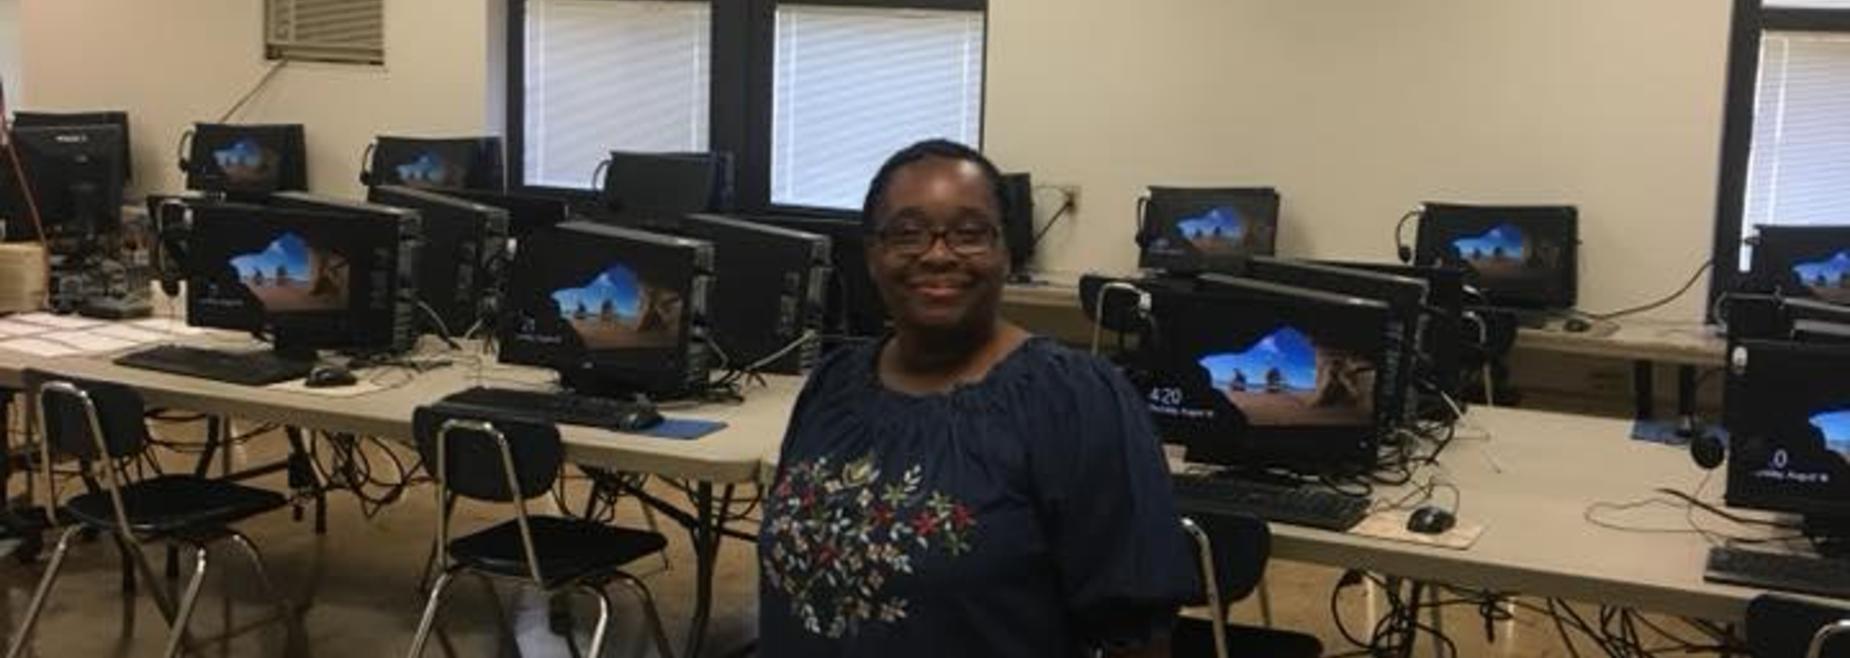 Mrs. Annette's computer lab